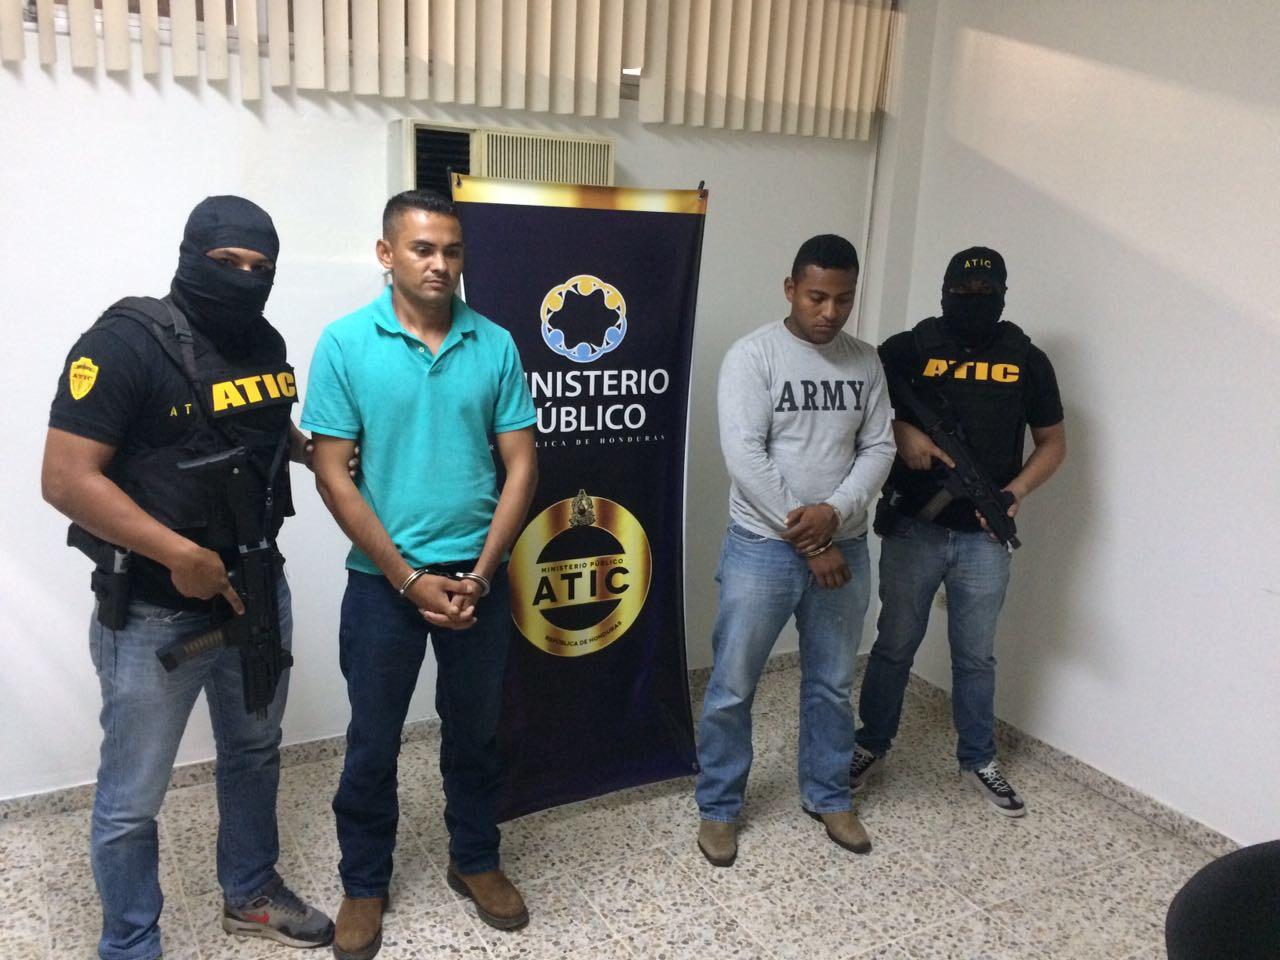 exmilitares condenados por doble de asesinato y asociación ilícita